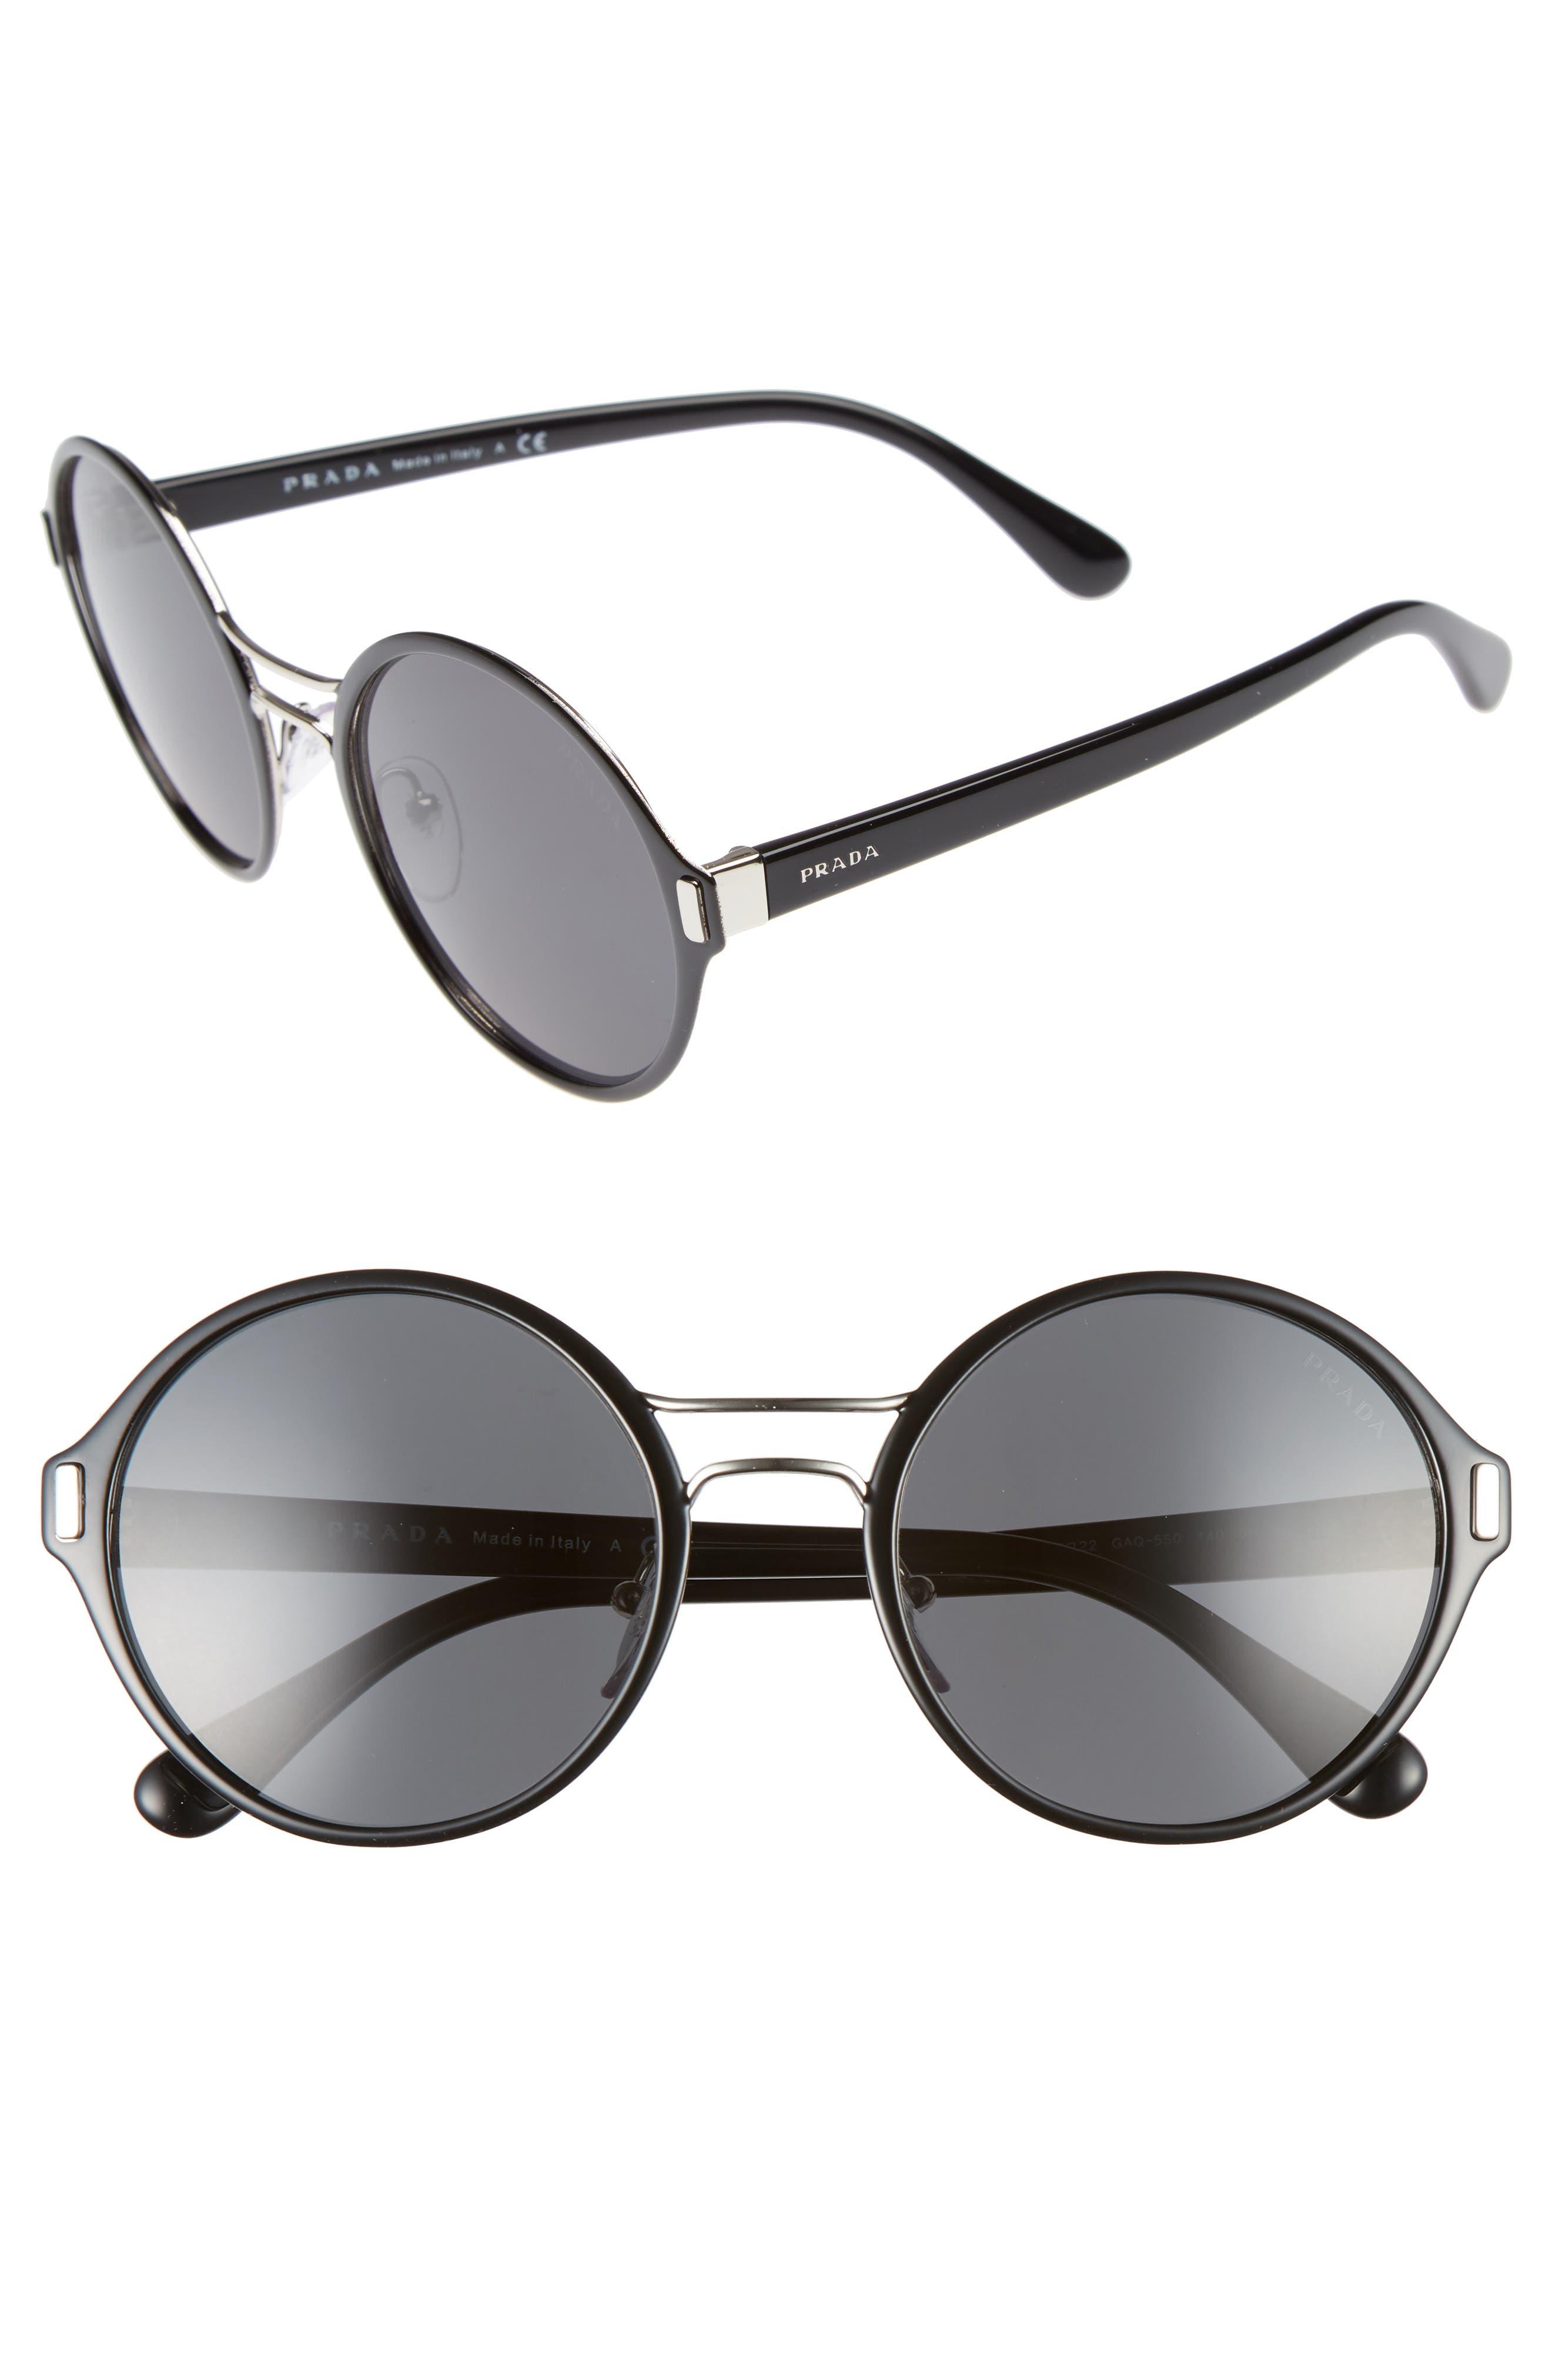 54mm Round Sunglasses,                         Main,                         color, 001